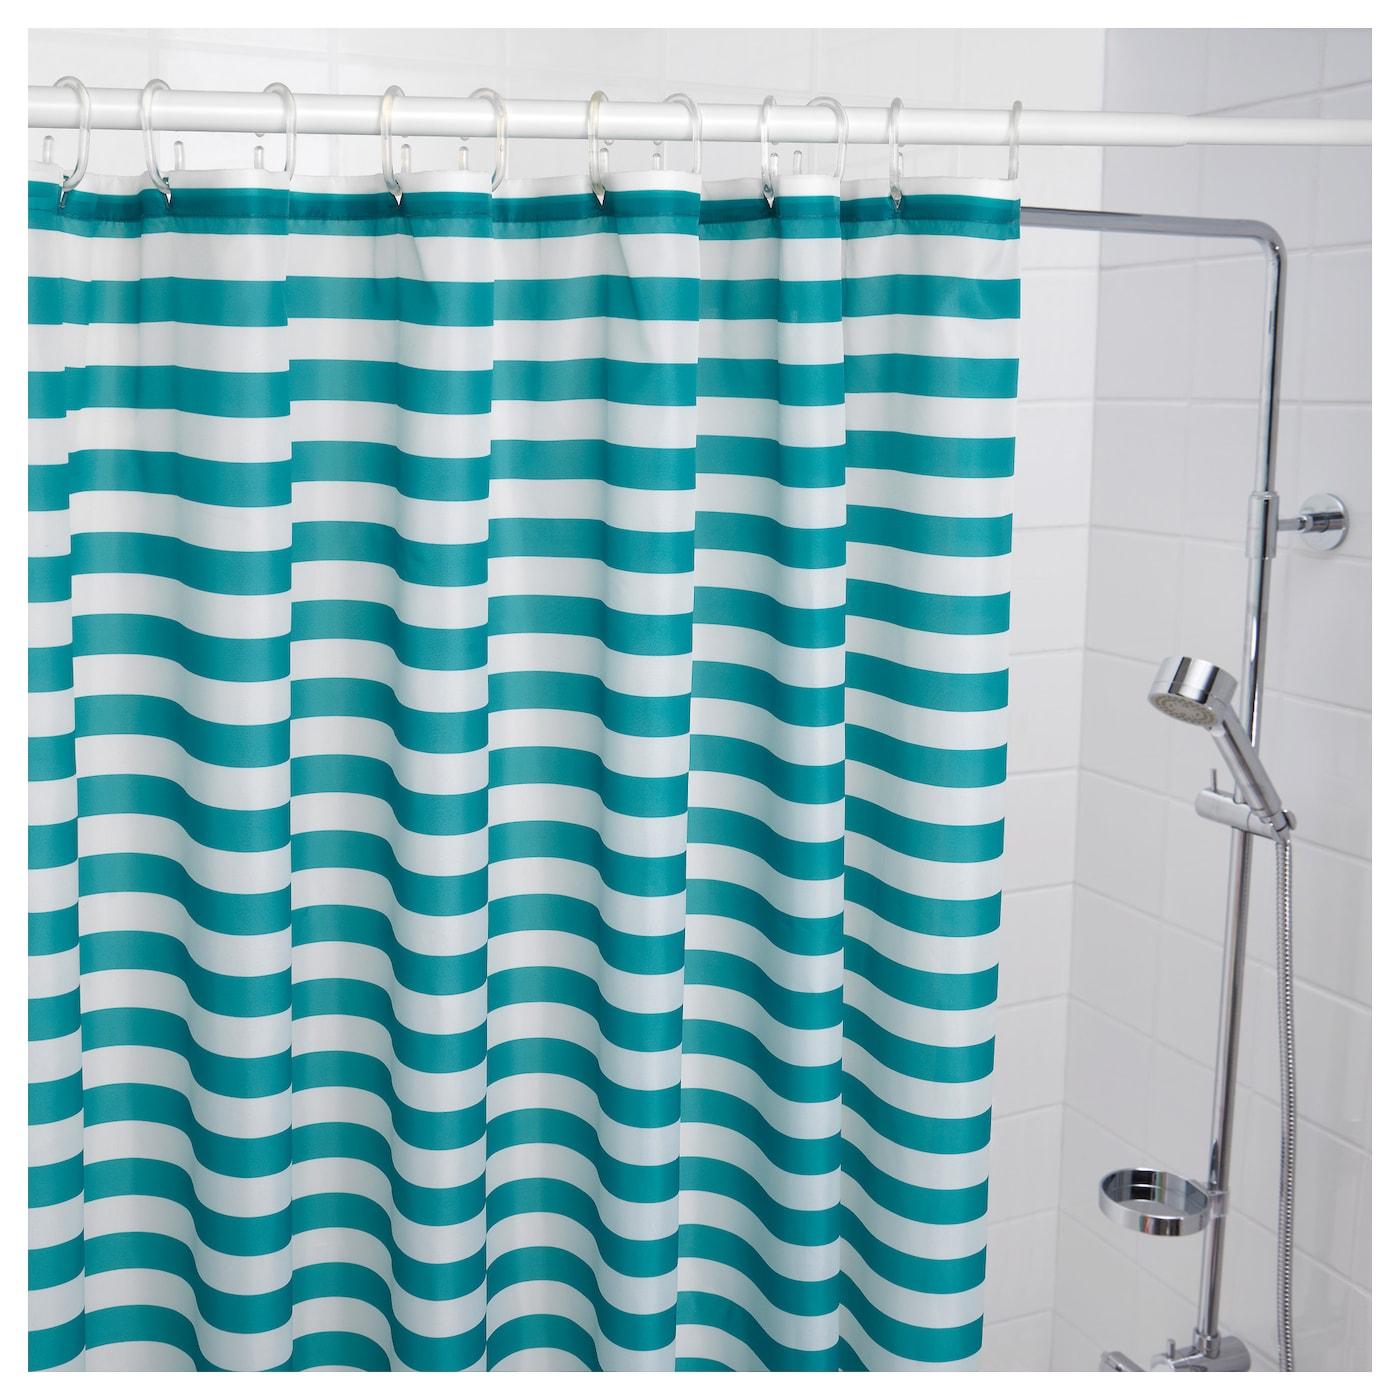 VADSJÖN Shower curtain Turquoise 180x180 cm - IKEA